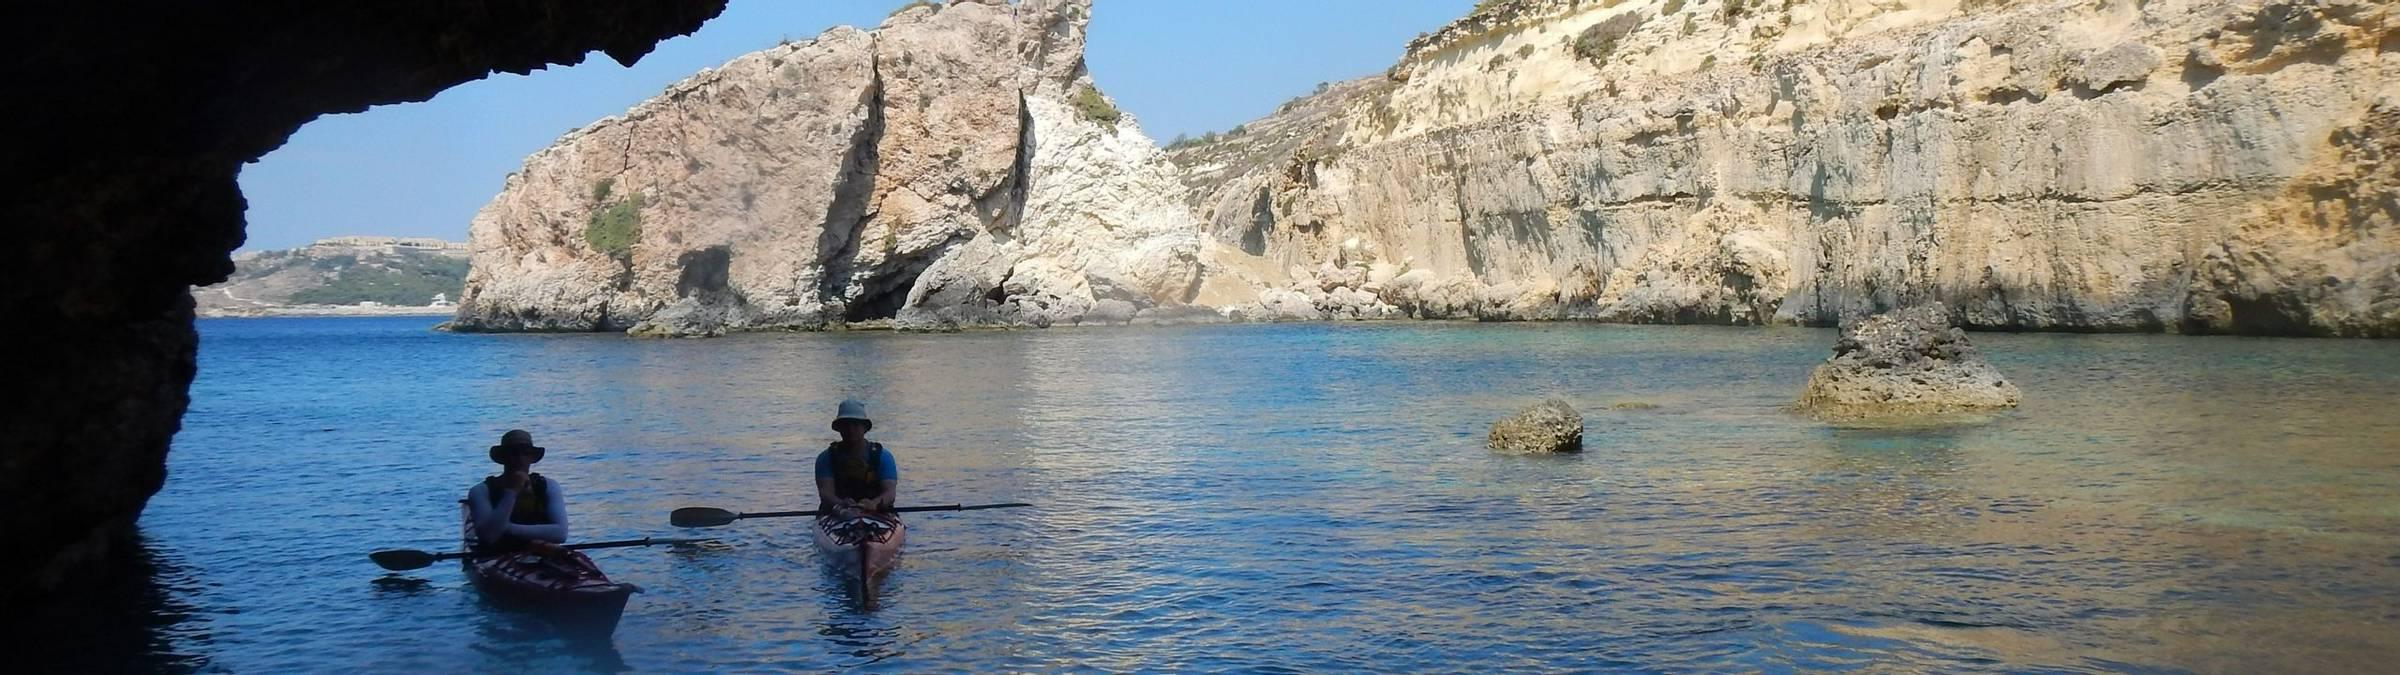 Gozo - Dawn Gibson 30 Jul 13 - kayaking.jpg